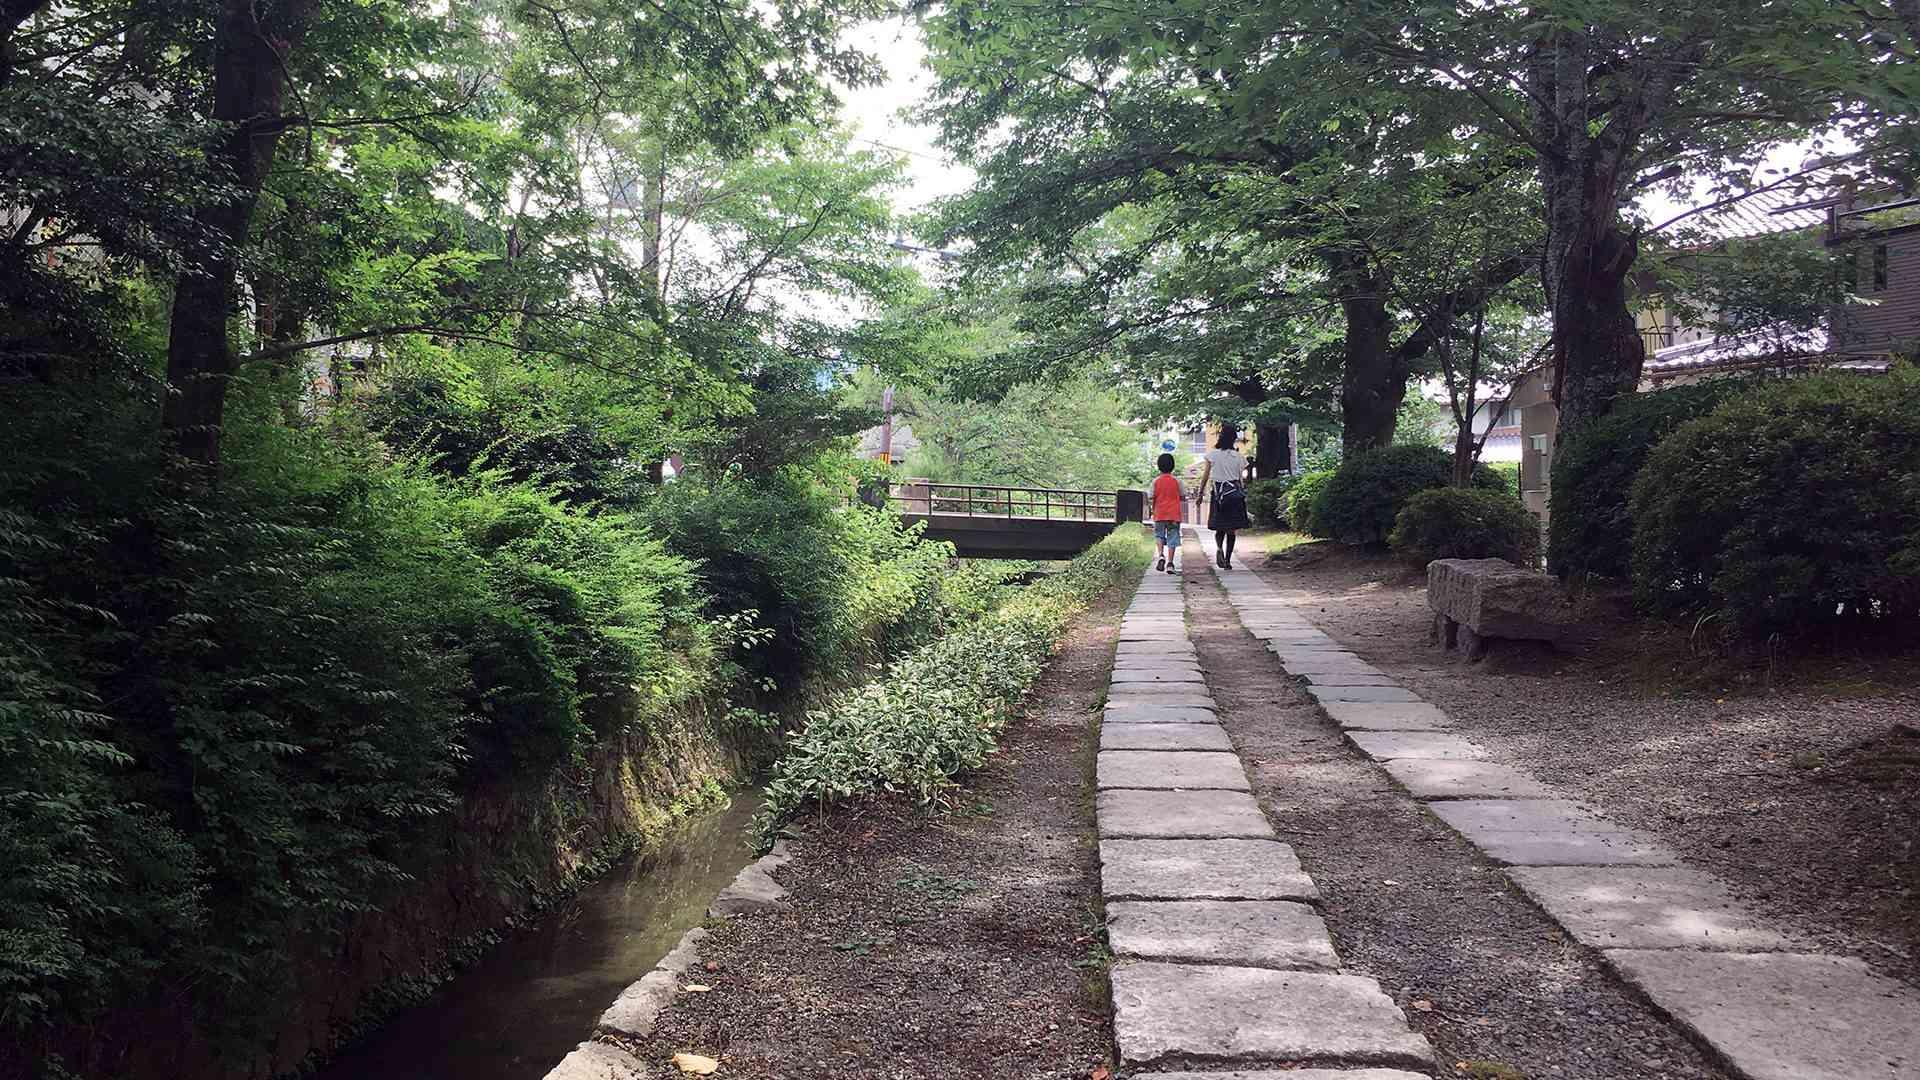 Sentiero del filoso Kyoto